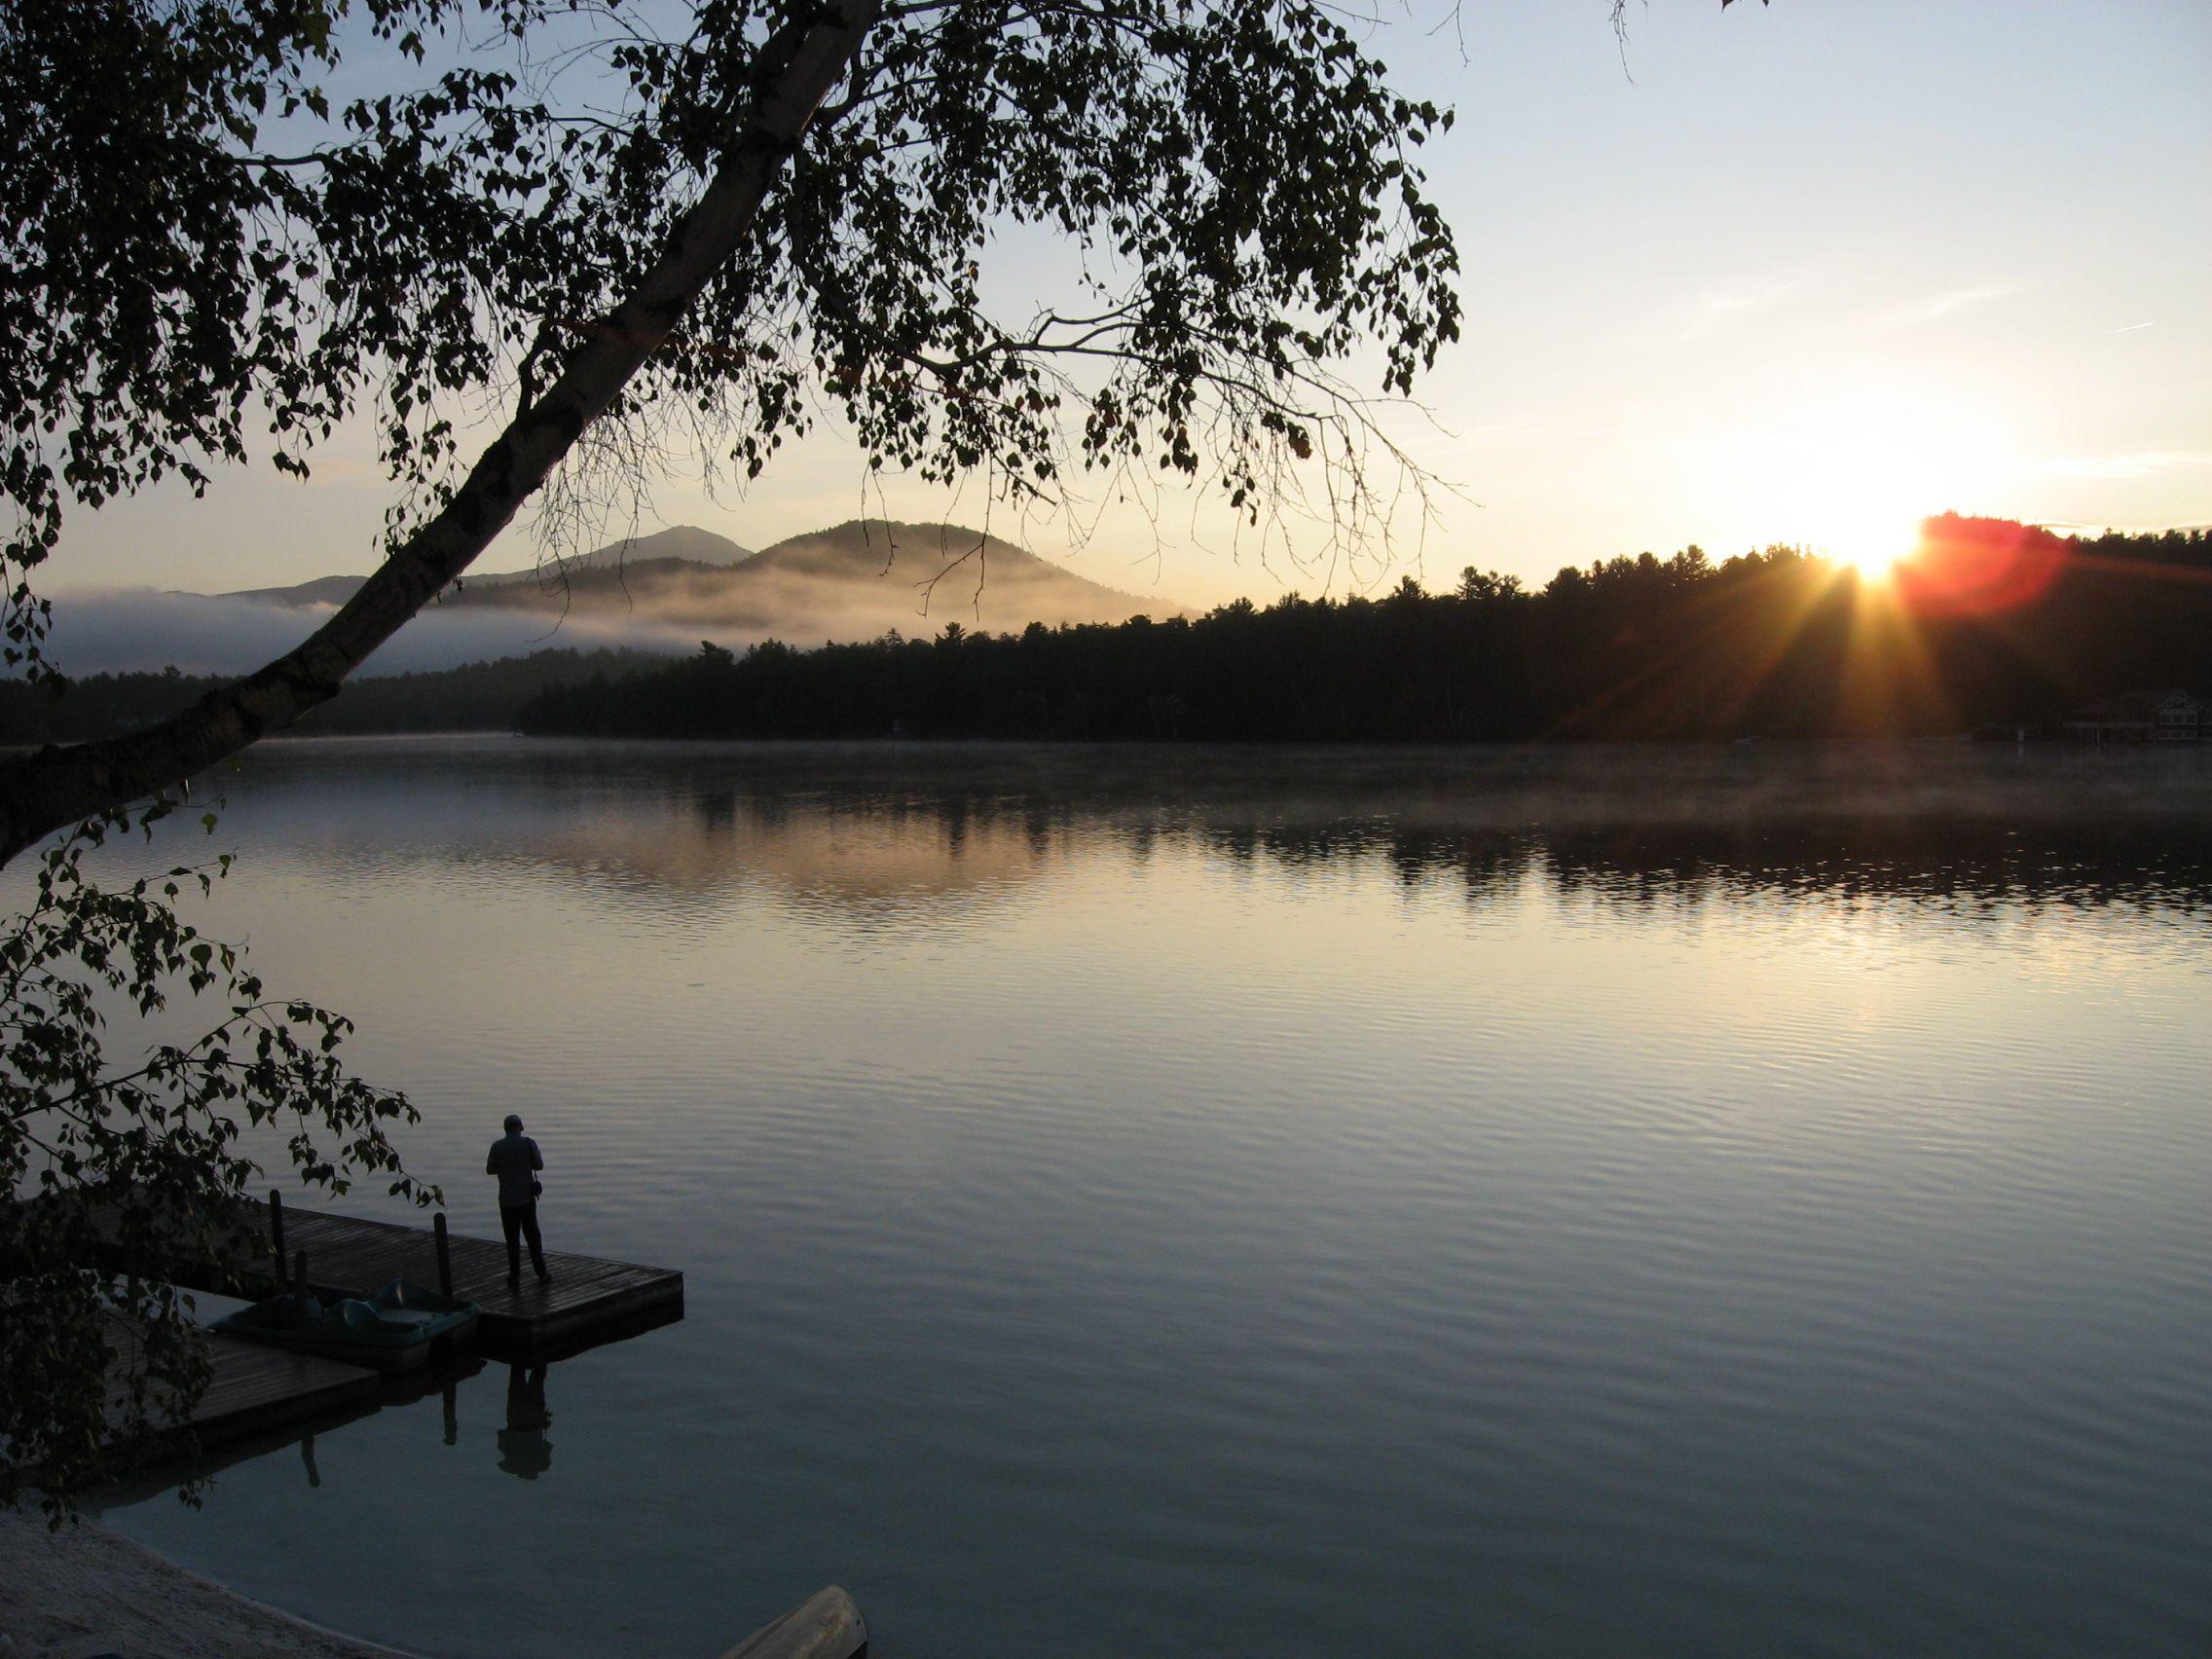 golden arrow lakeside resort lake placid new york resort